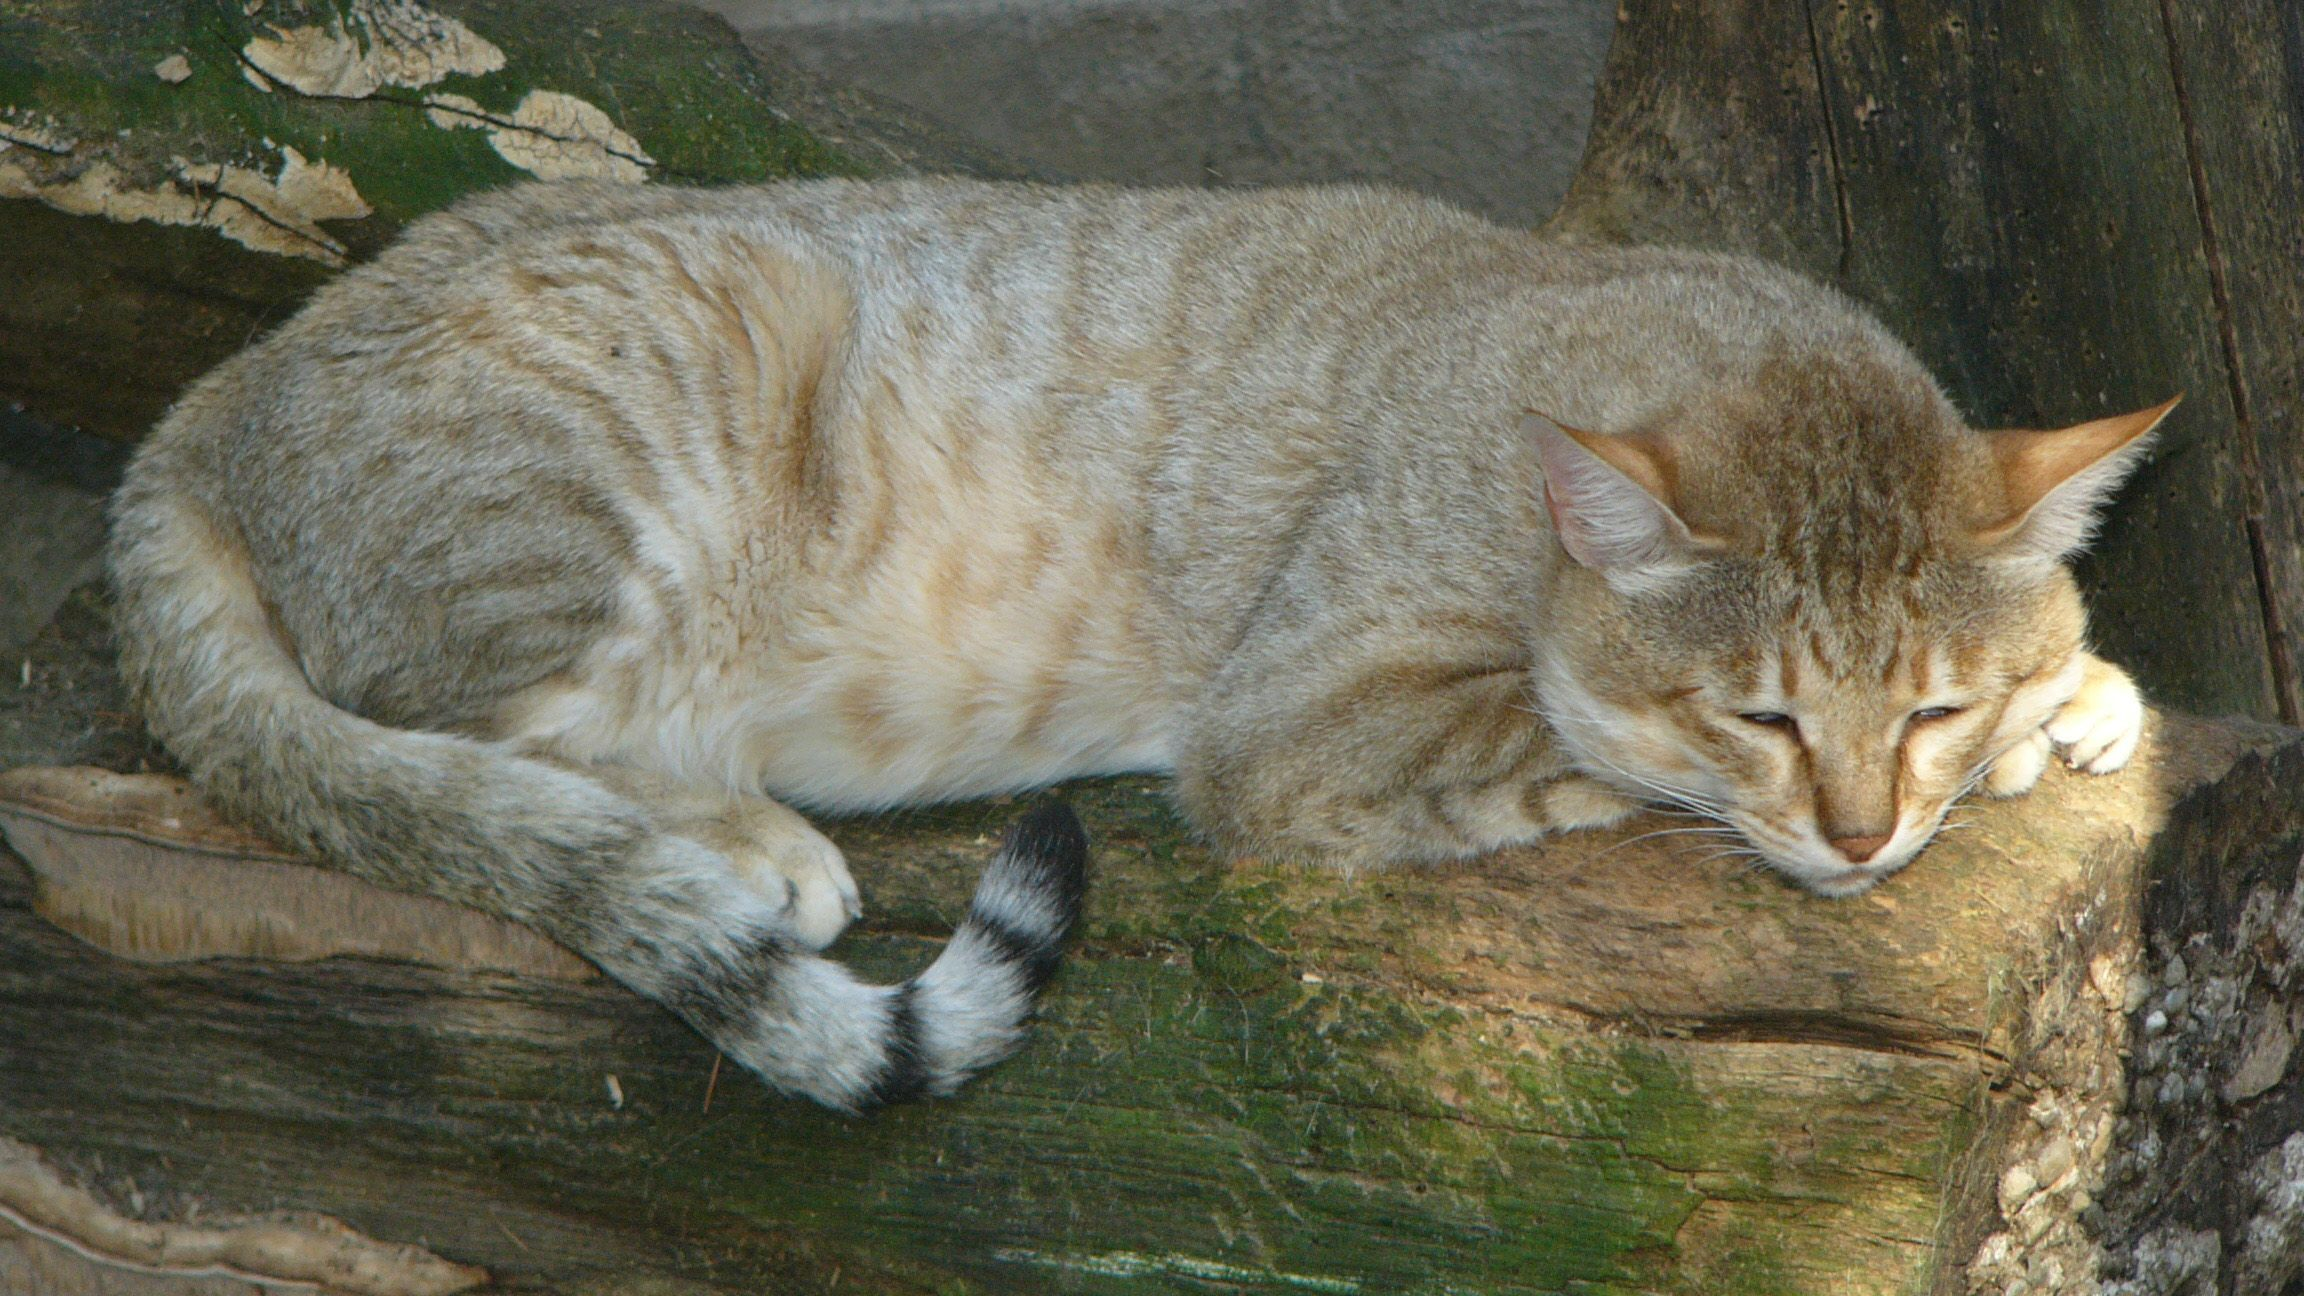 Arabian wildcat Wikipedia, the free encyclopedia Chat